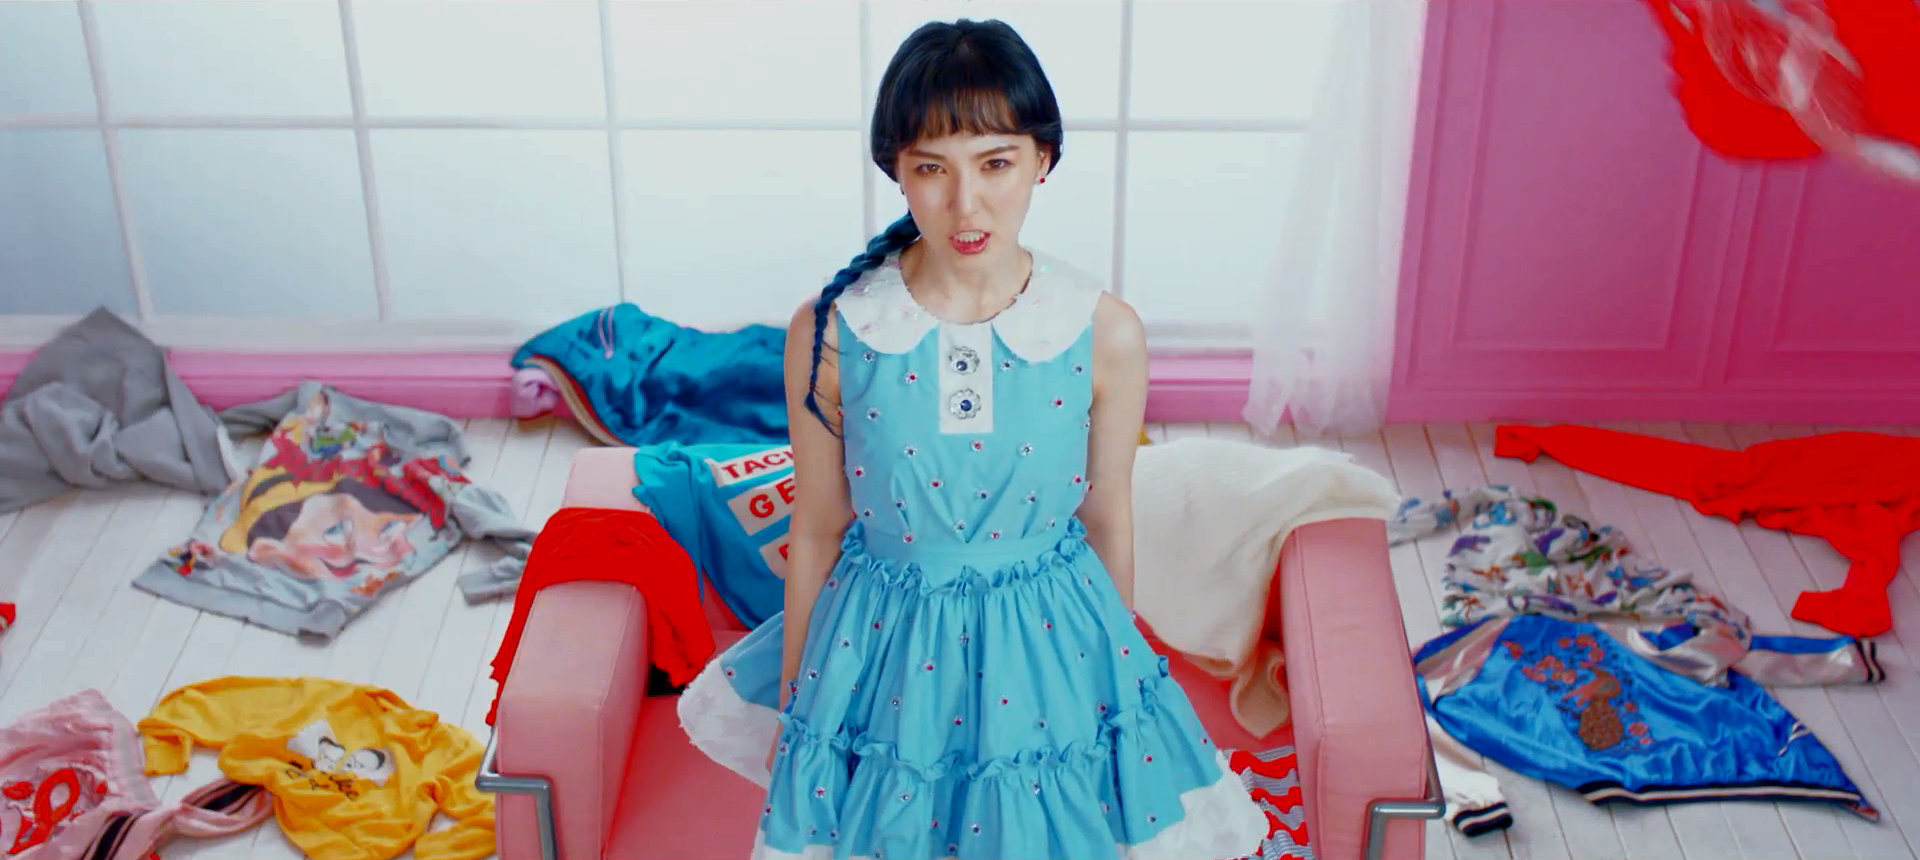 Red Velvet - Rookie who's who - K-Pop Database / dbkpop com